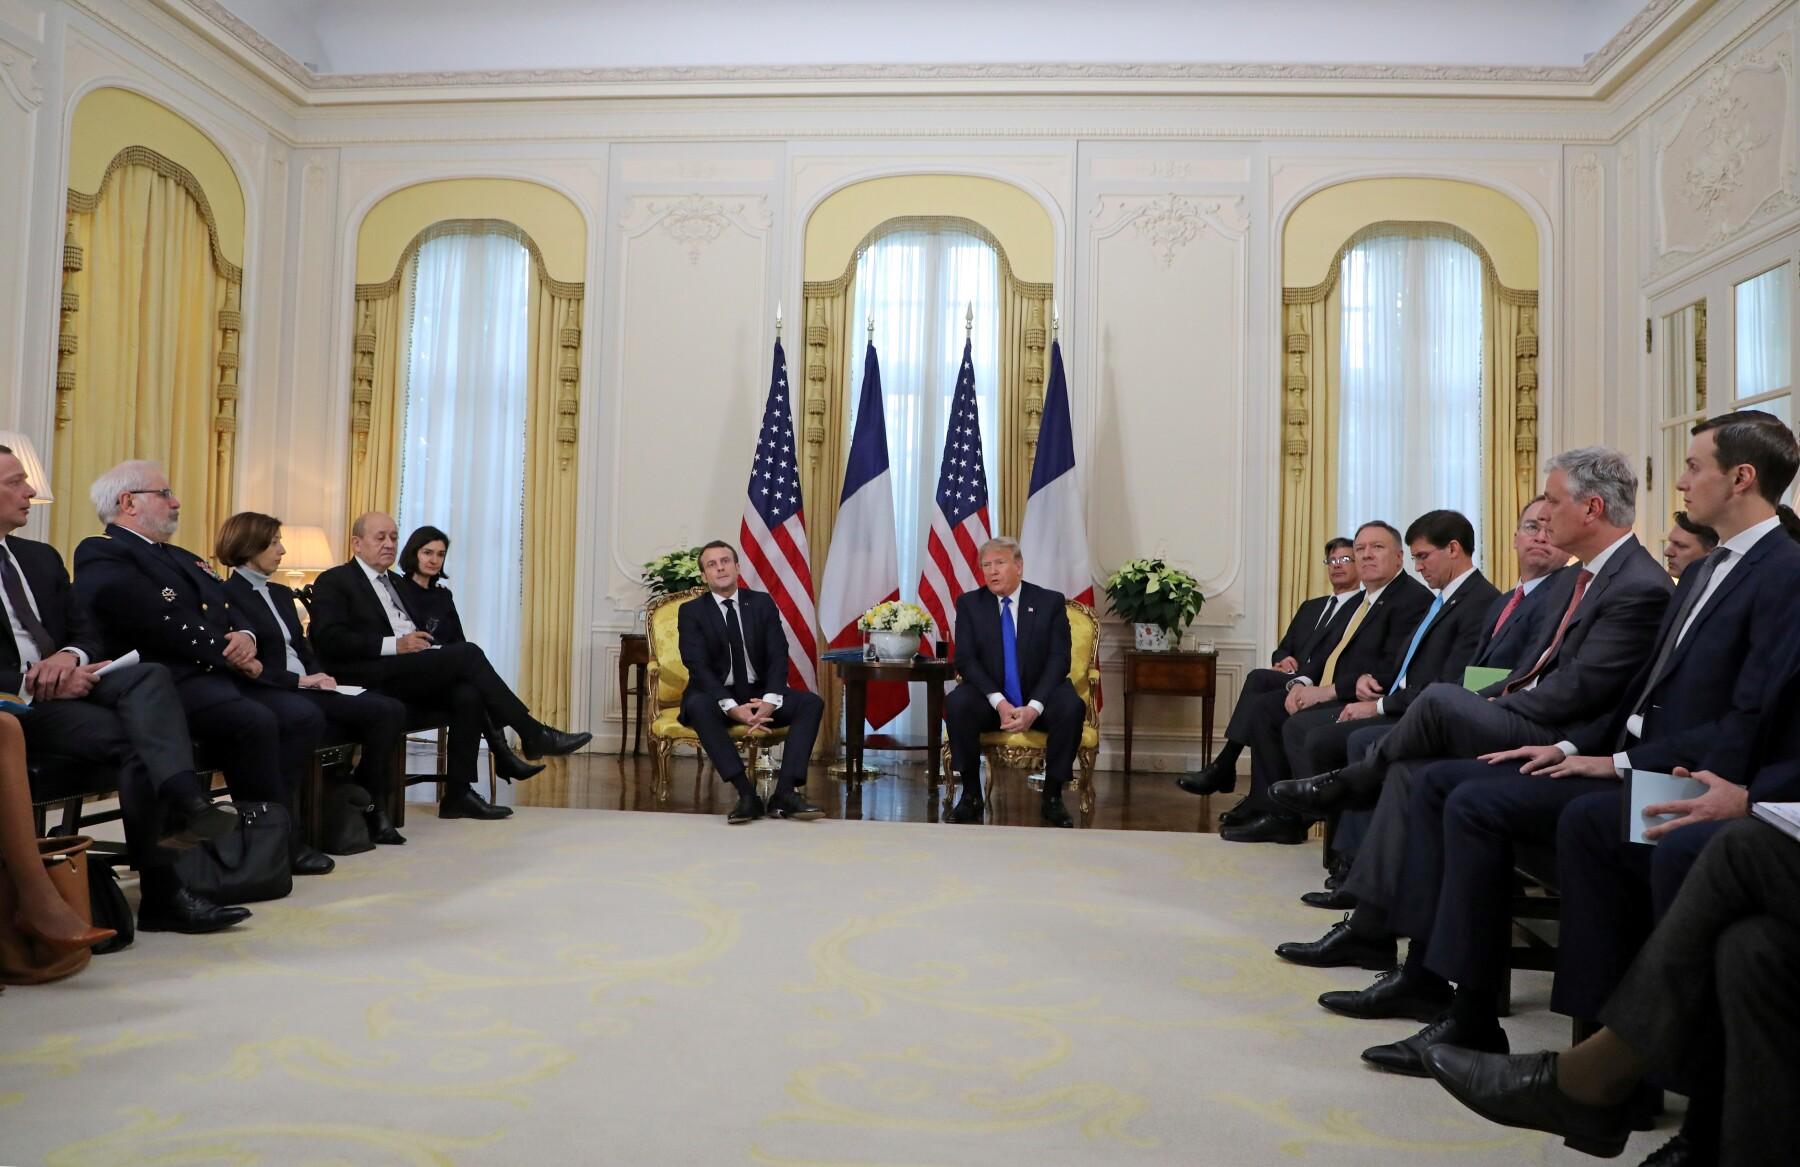 U.S. President Trump meets France's President Macron, ahead of the NATO summit, in London